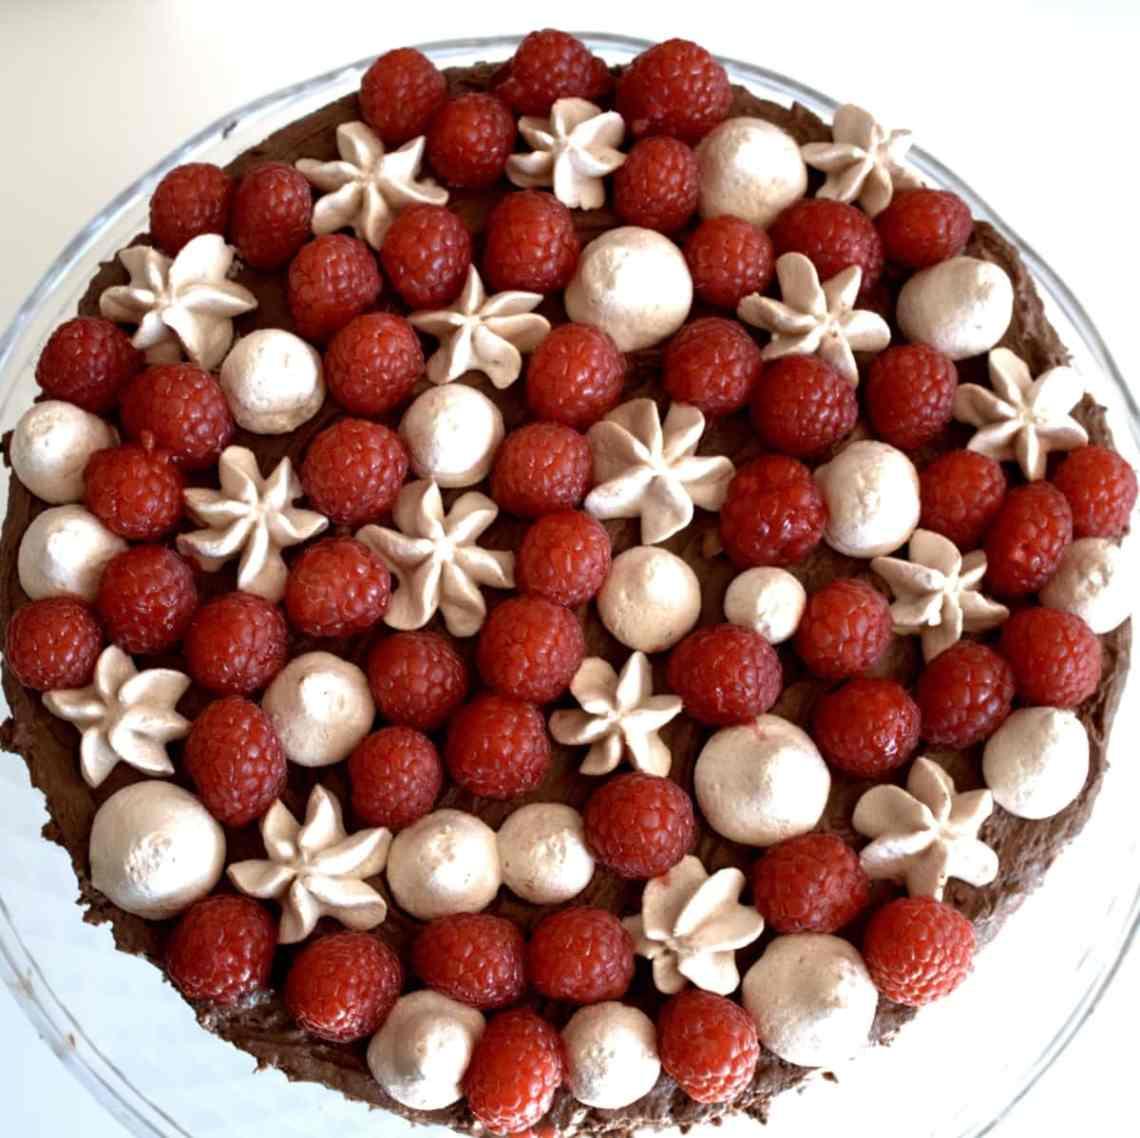 Chokoladelagkage - en lagkage med chokolademousse, mørke bunde, hindbær og marengs - Find opskrifter, gratis print og inspiration til årets gang på danishthings.com (Recipe in Danish)